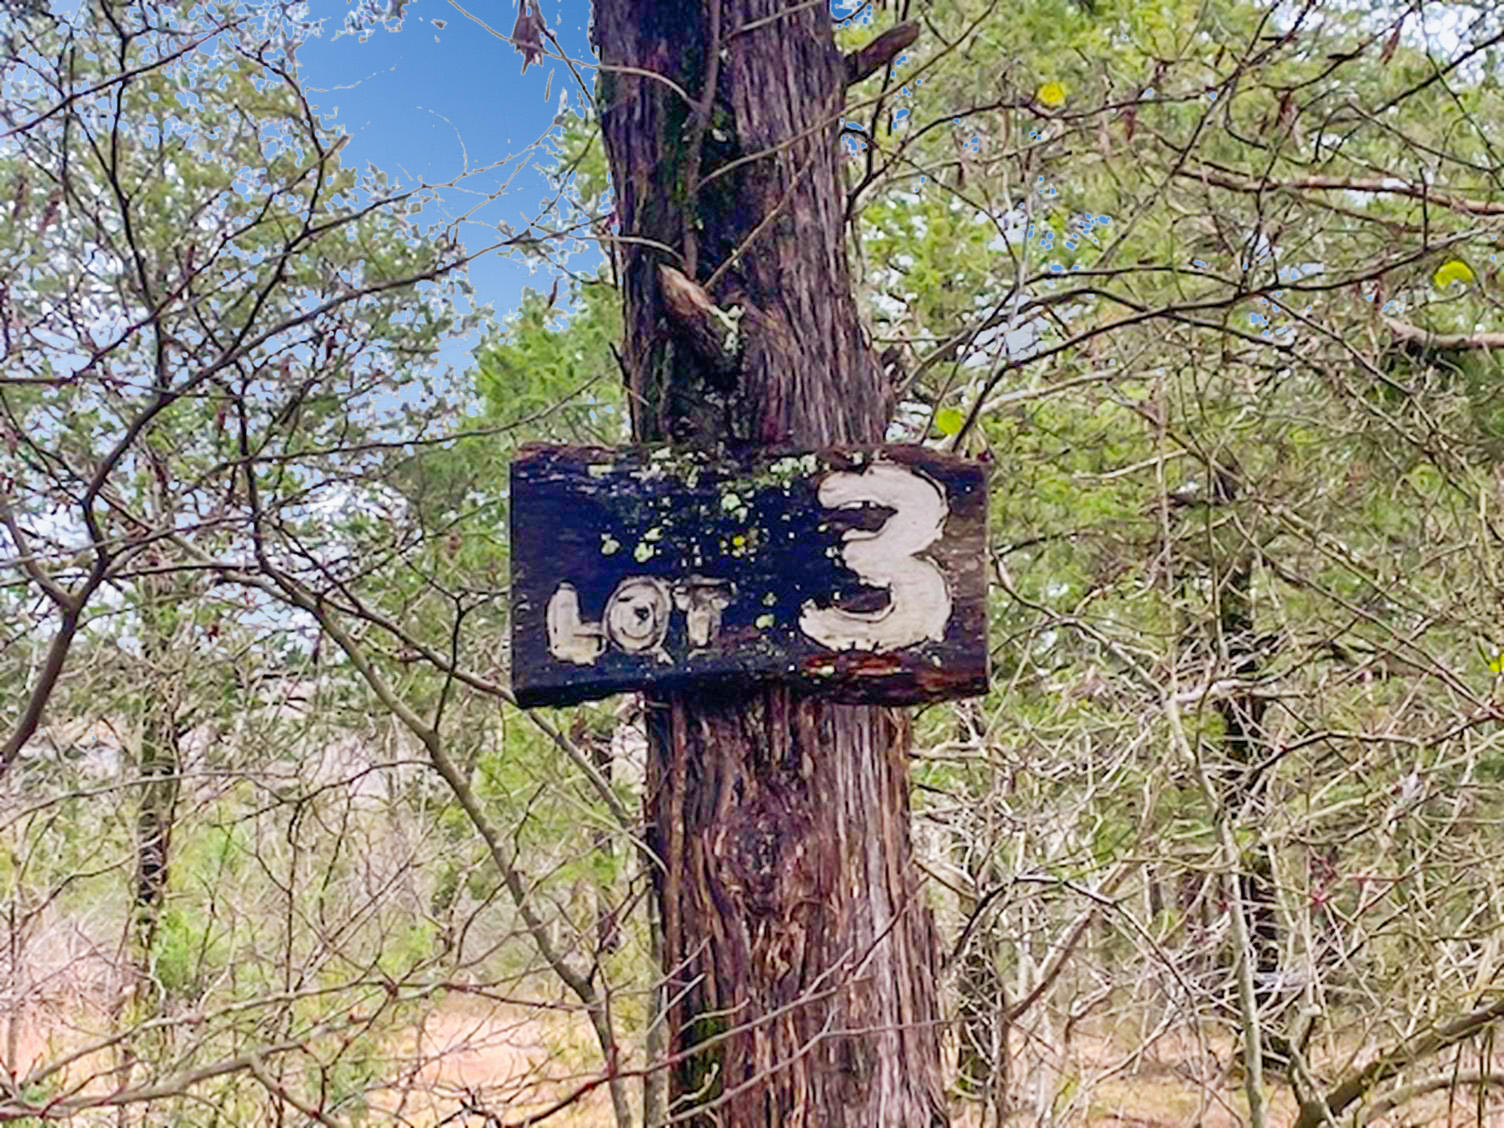 Tbd Mills Hollow Road Branson, MO 65616